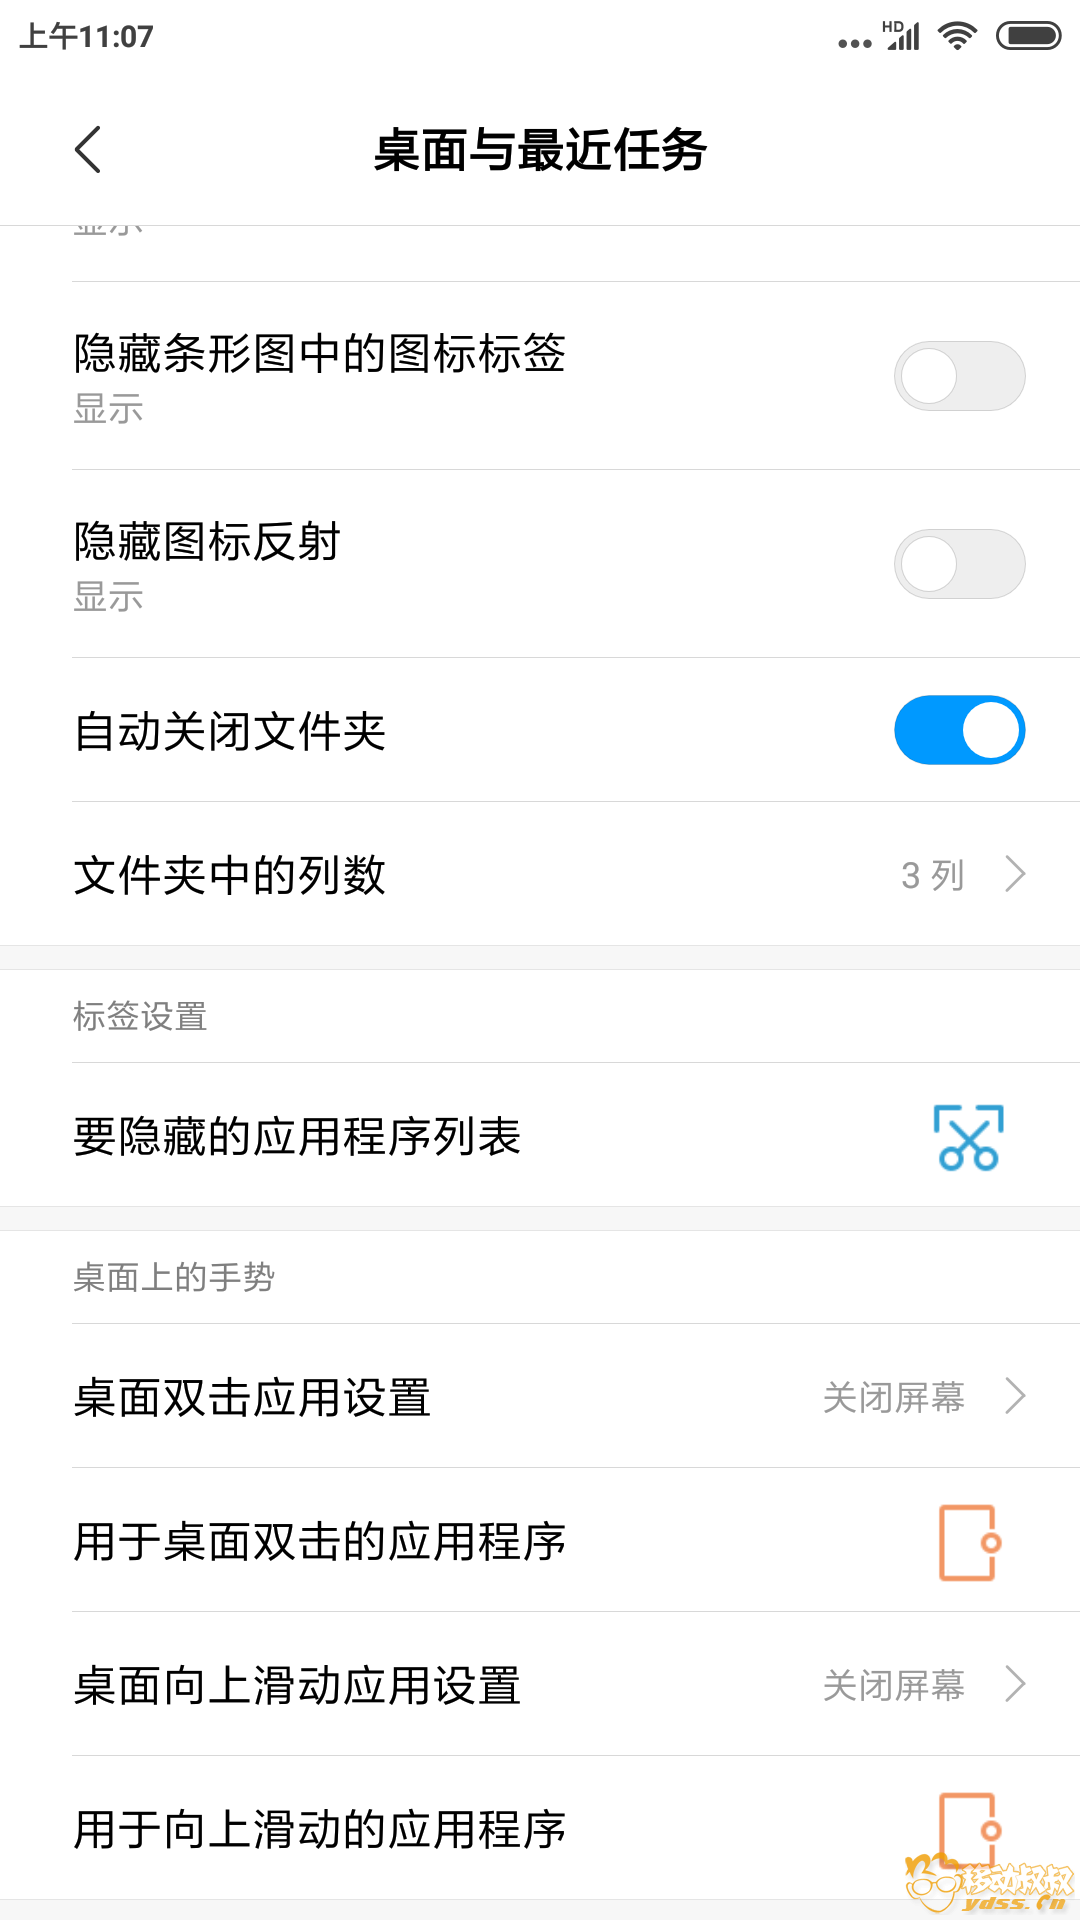 Screenshot_2018-07-02-11-07-23-117_com.android.settings.png